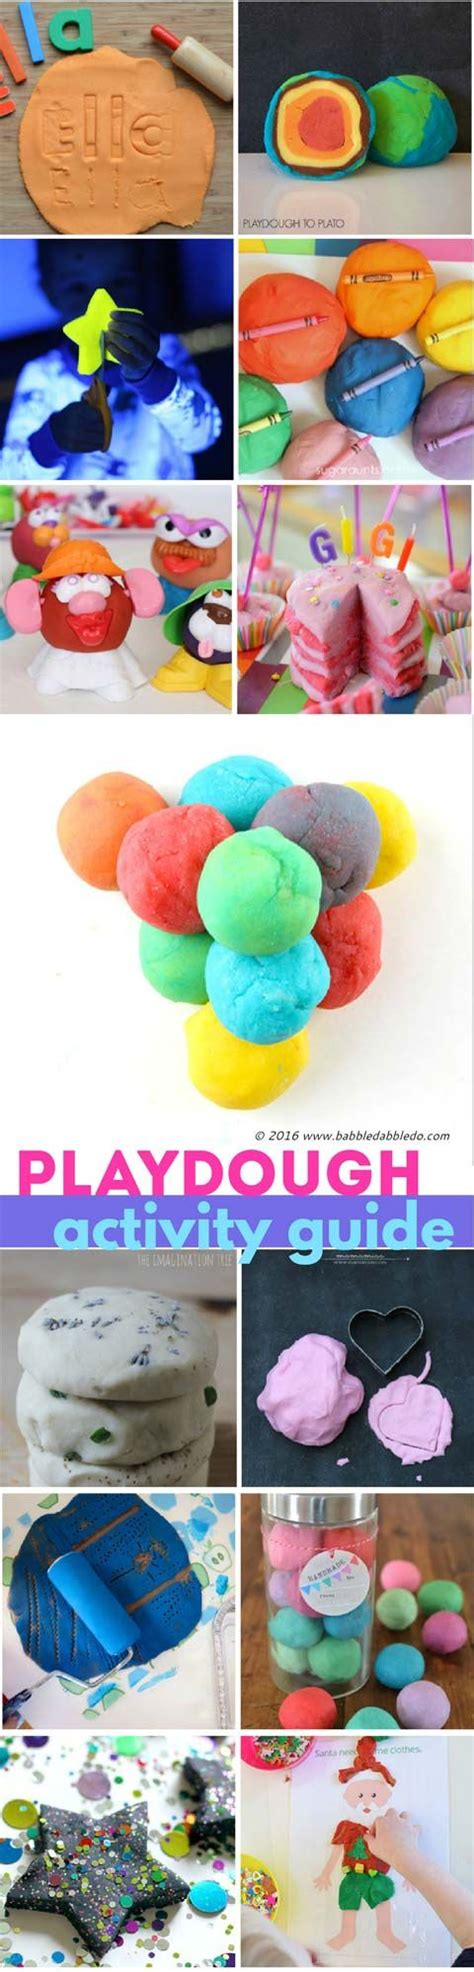 how to make playdough playdough activities